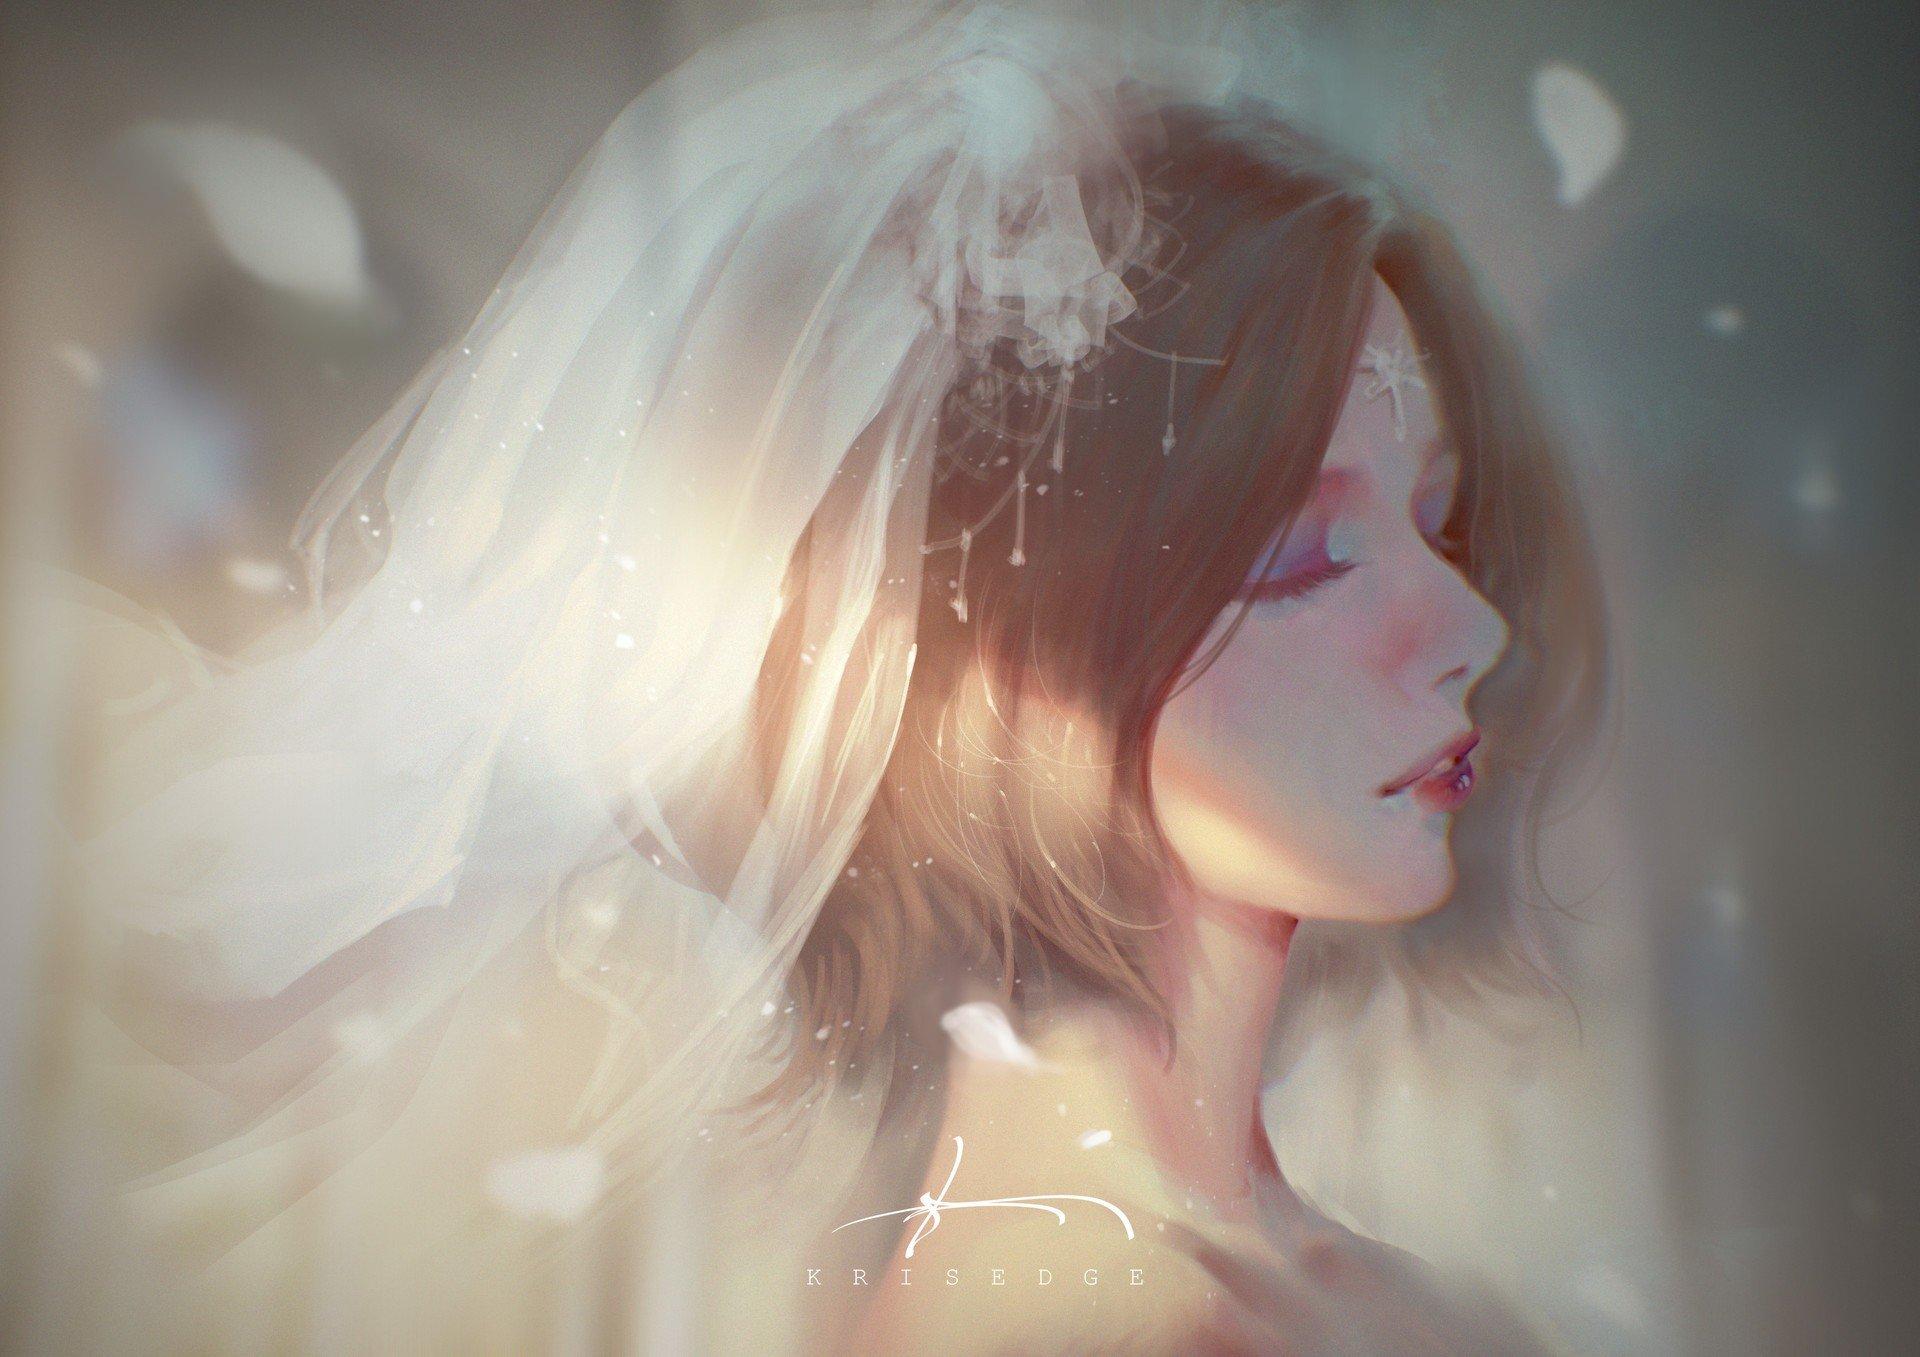 fantasy art, Weddings, Wedding dress Wallpaper